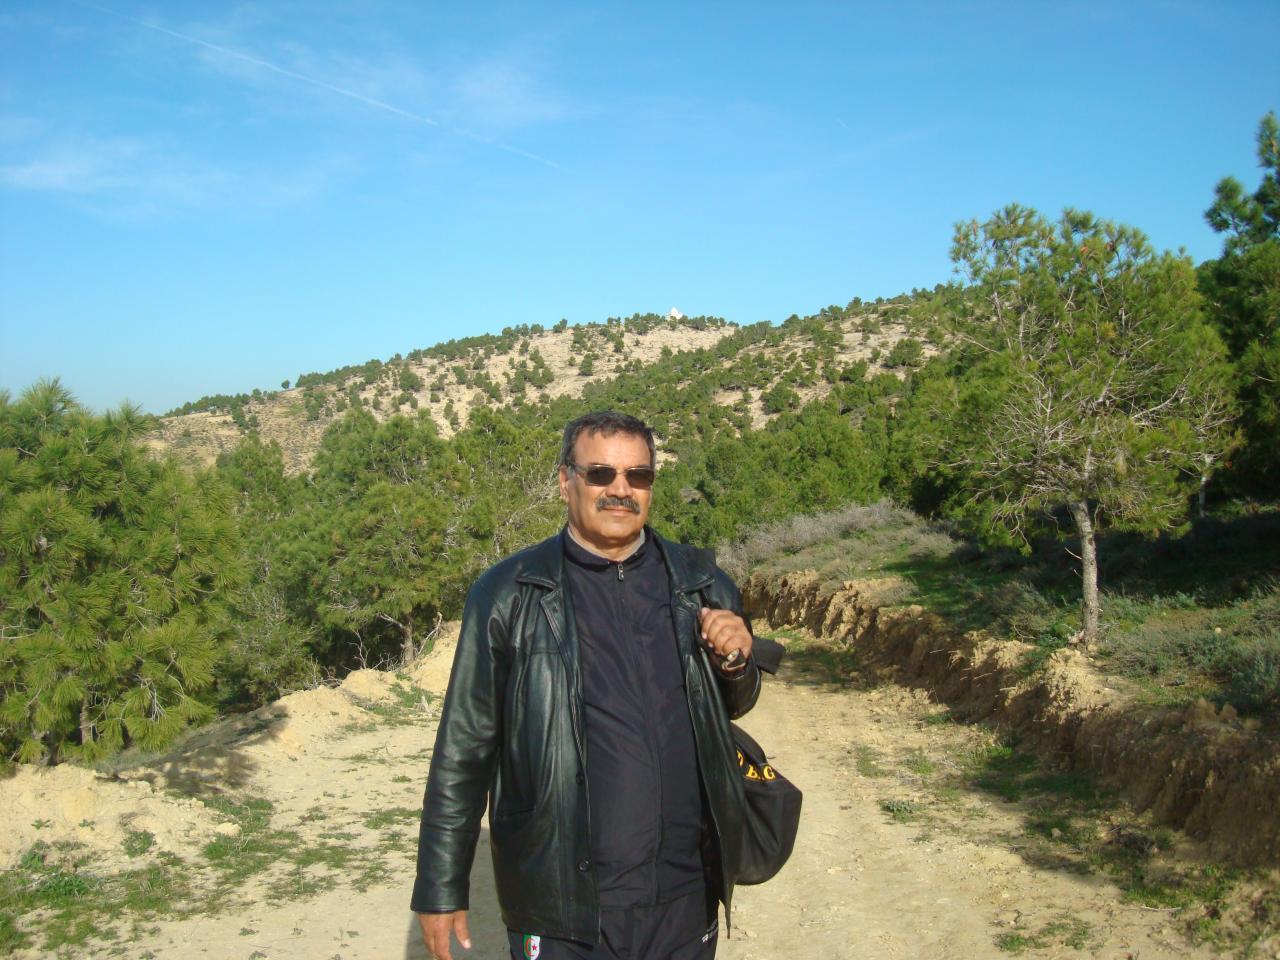 Habib Bendenia au Djebel El Djir El-Ghomri